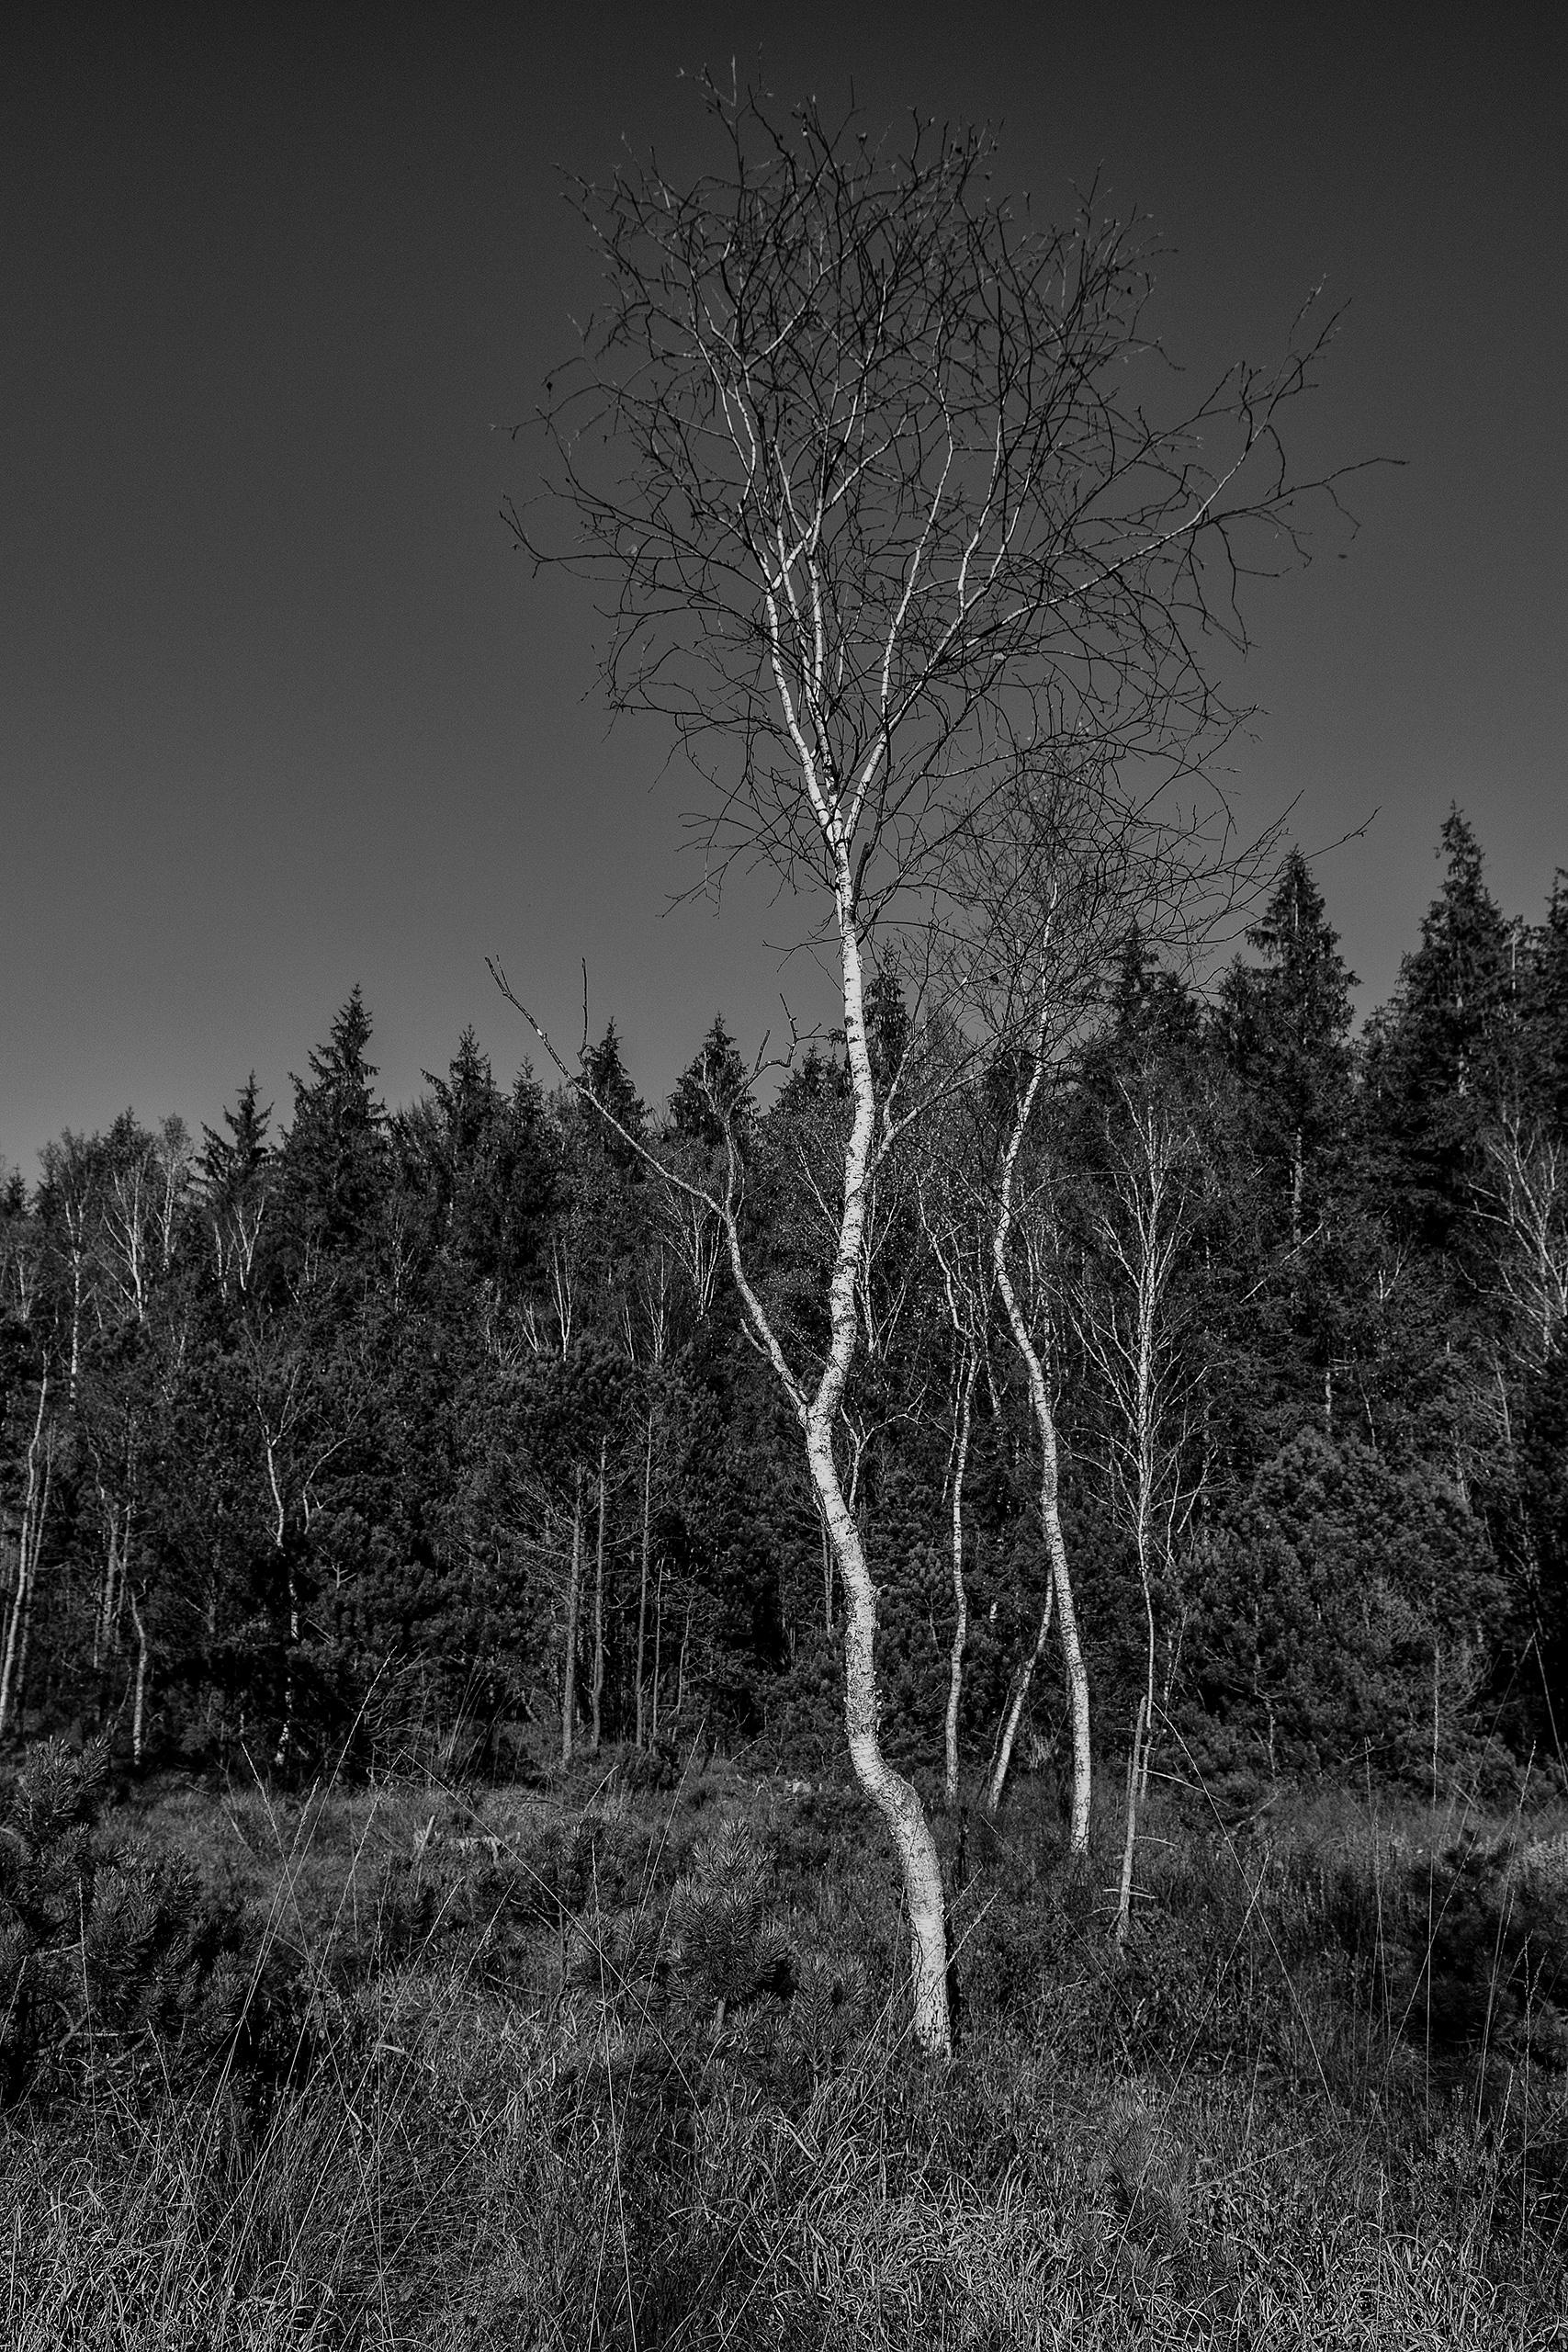 simply slender birch trees high - christofkessemeier   ello